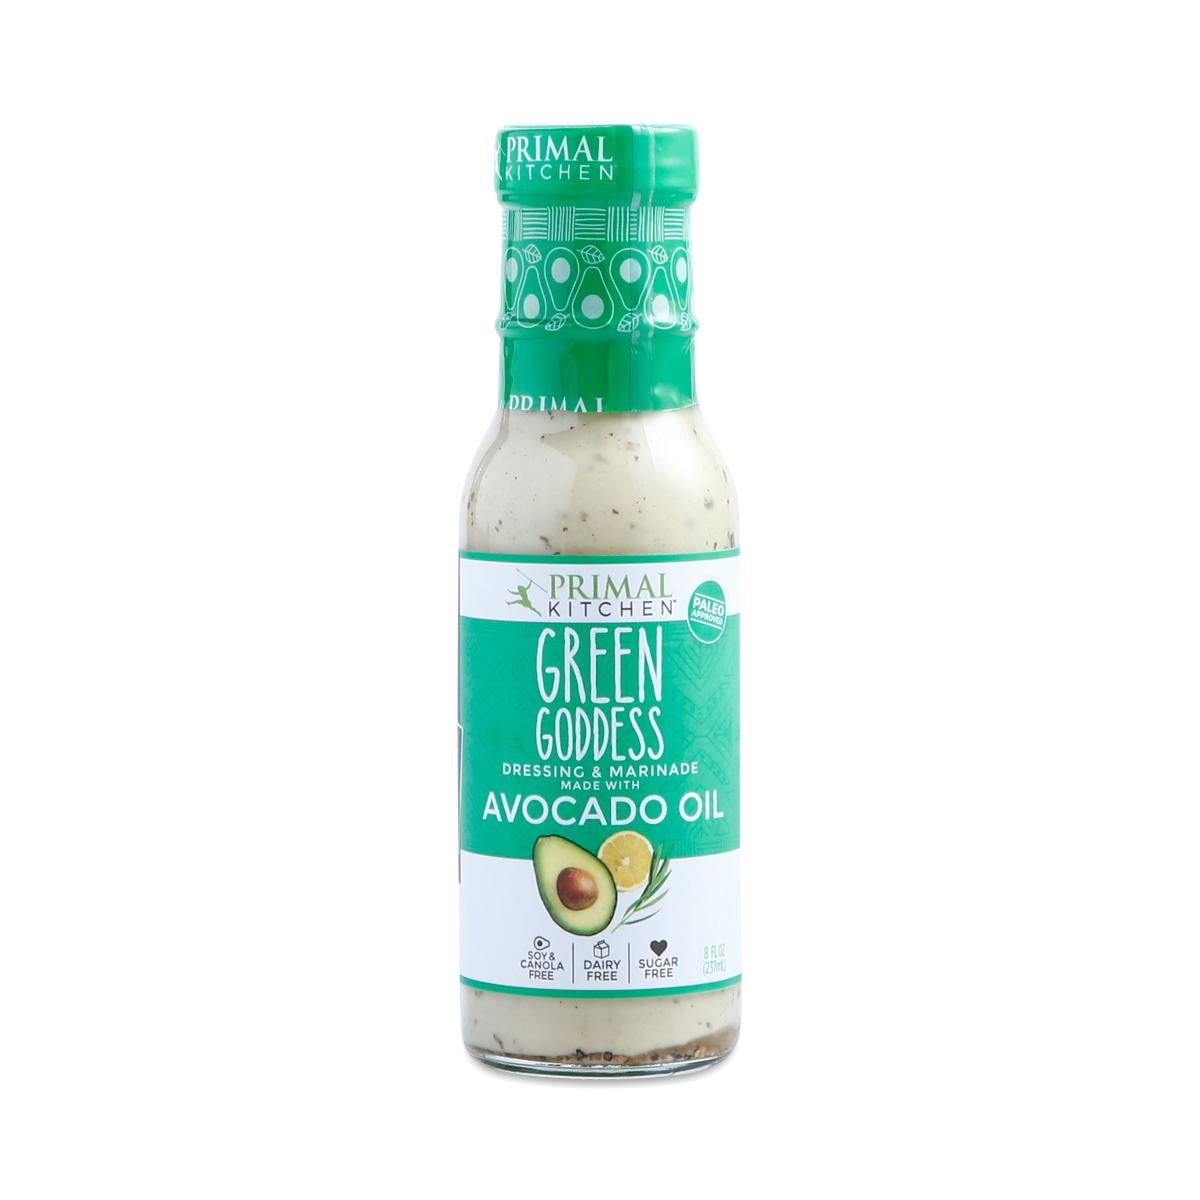 Primal Kitchen Green Goddess Avocado Oil Dressing